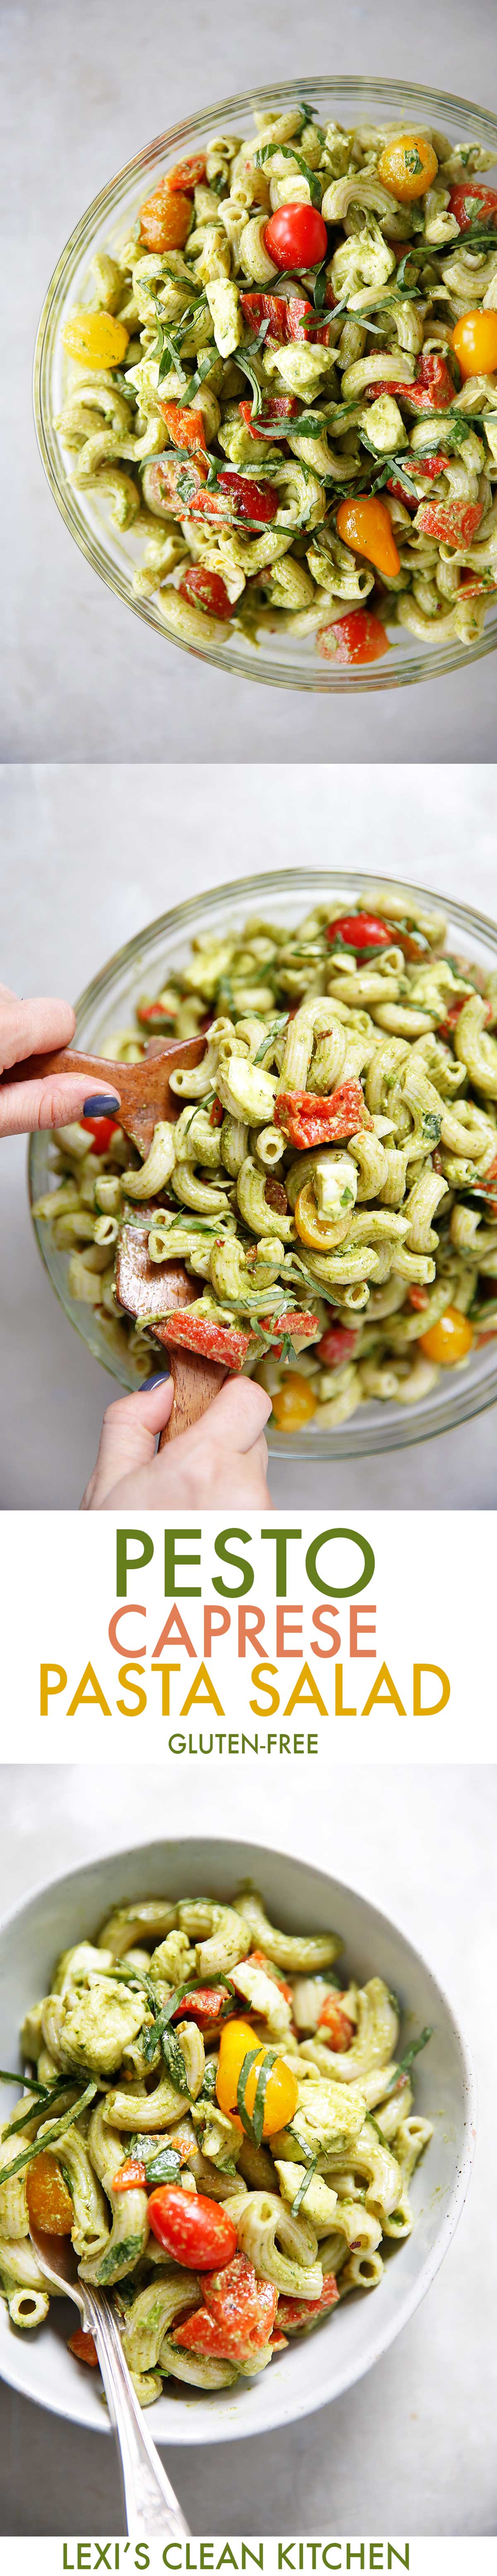 Gluten-Free Pesto Caprese Pasta Salad | Lexi's Clean Kitchen